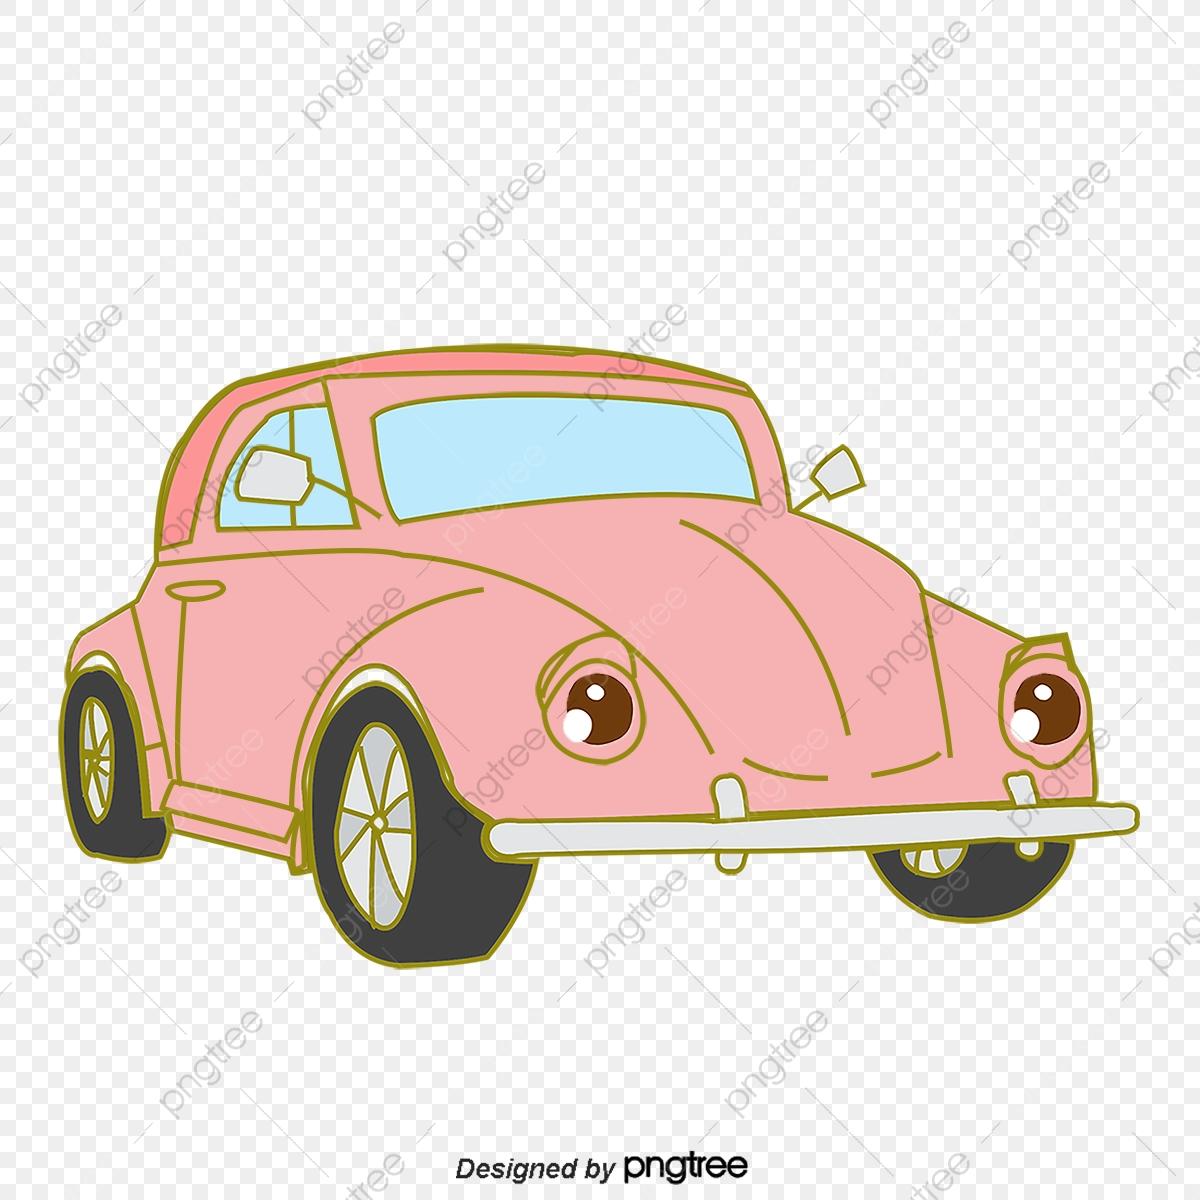 Clipart cars license. Retro blue classic vector